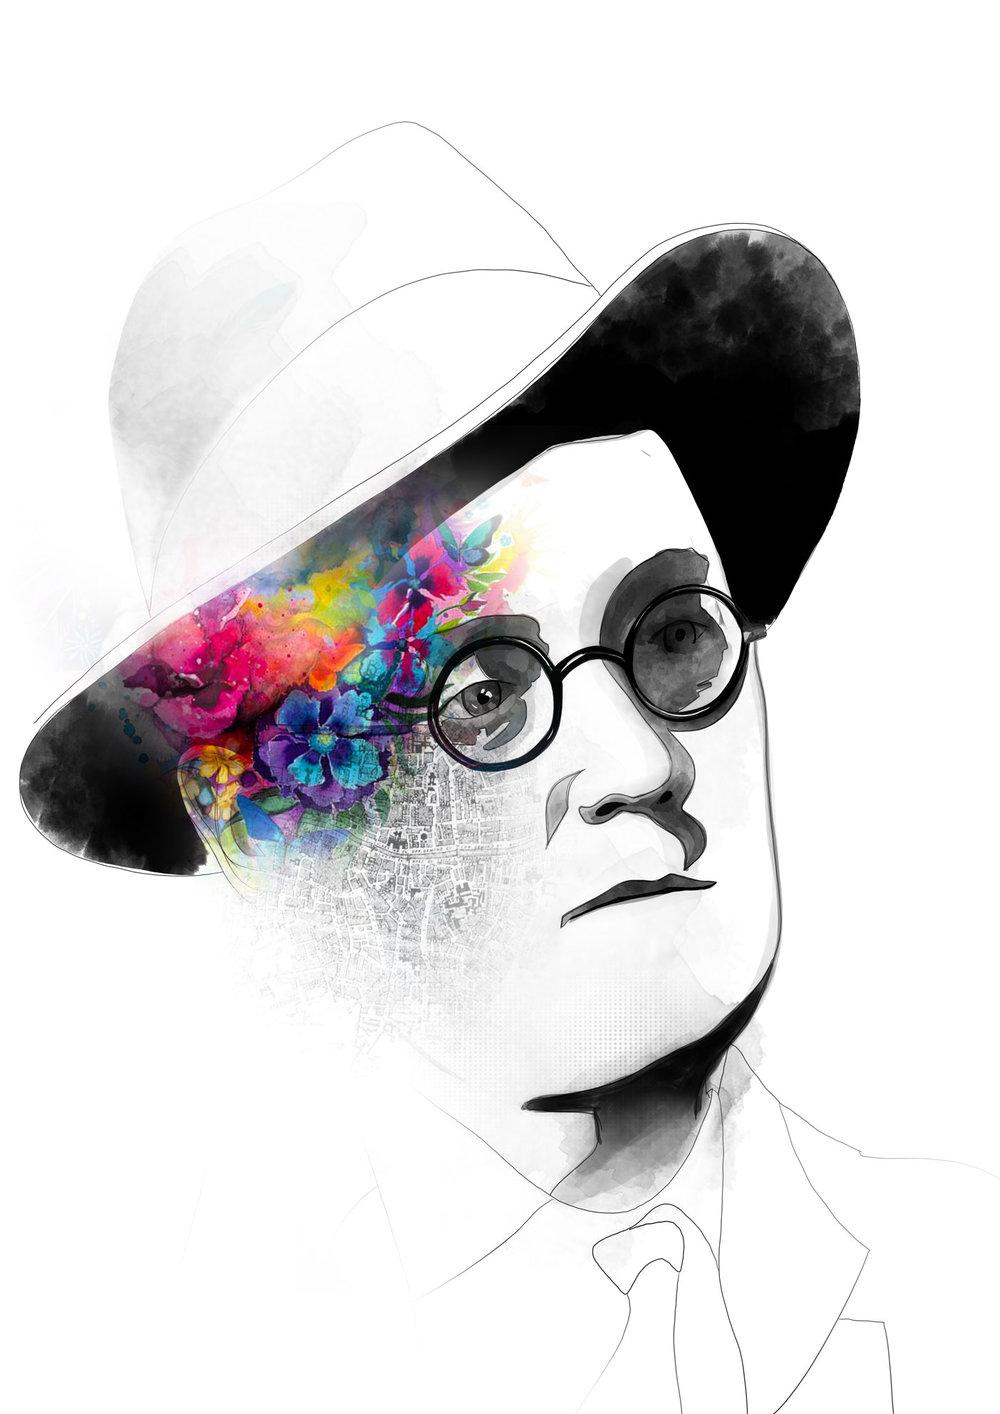 Reddin-designs-James-Joyce-detailed-design-lo-res.jpg